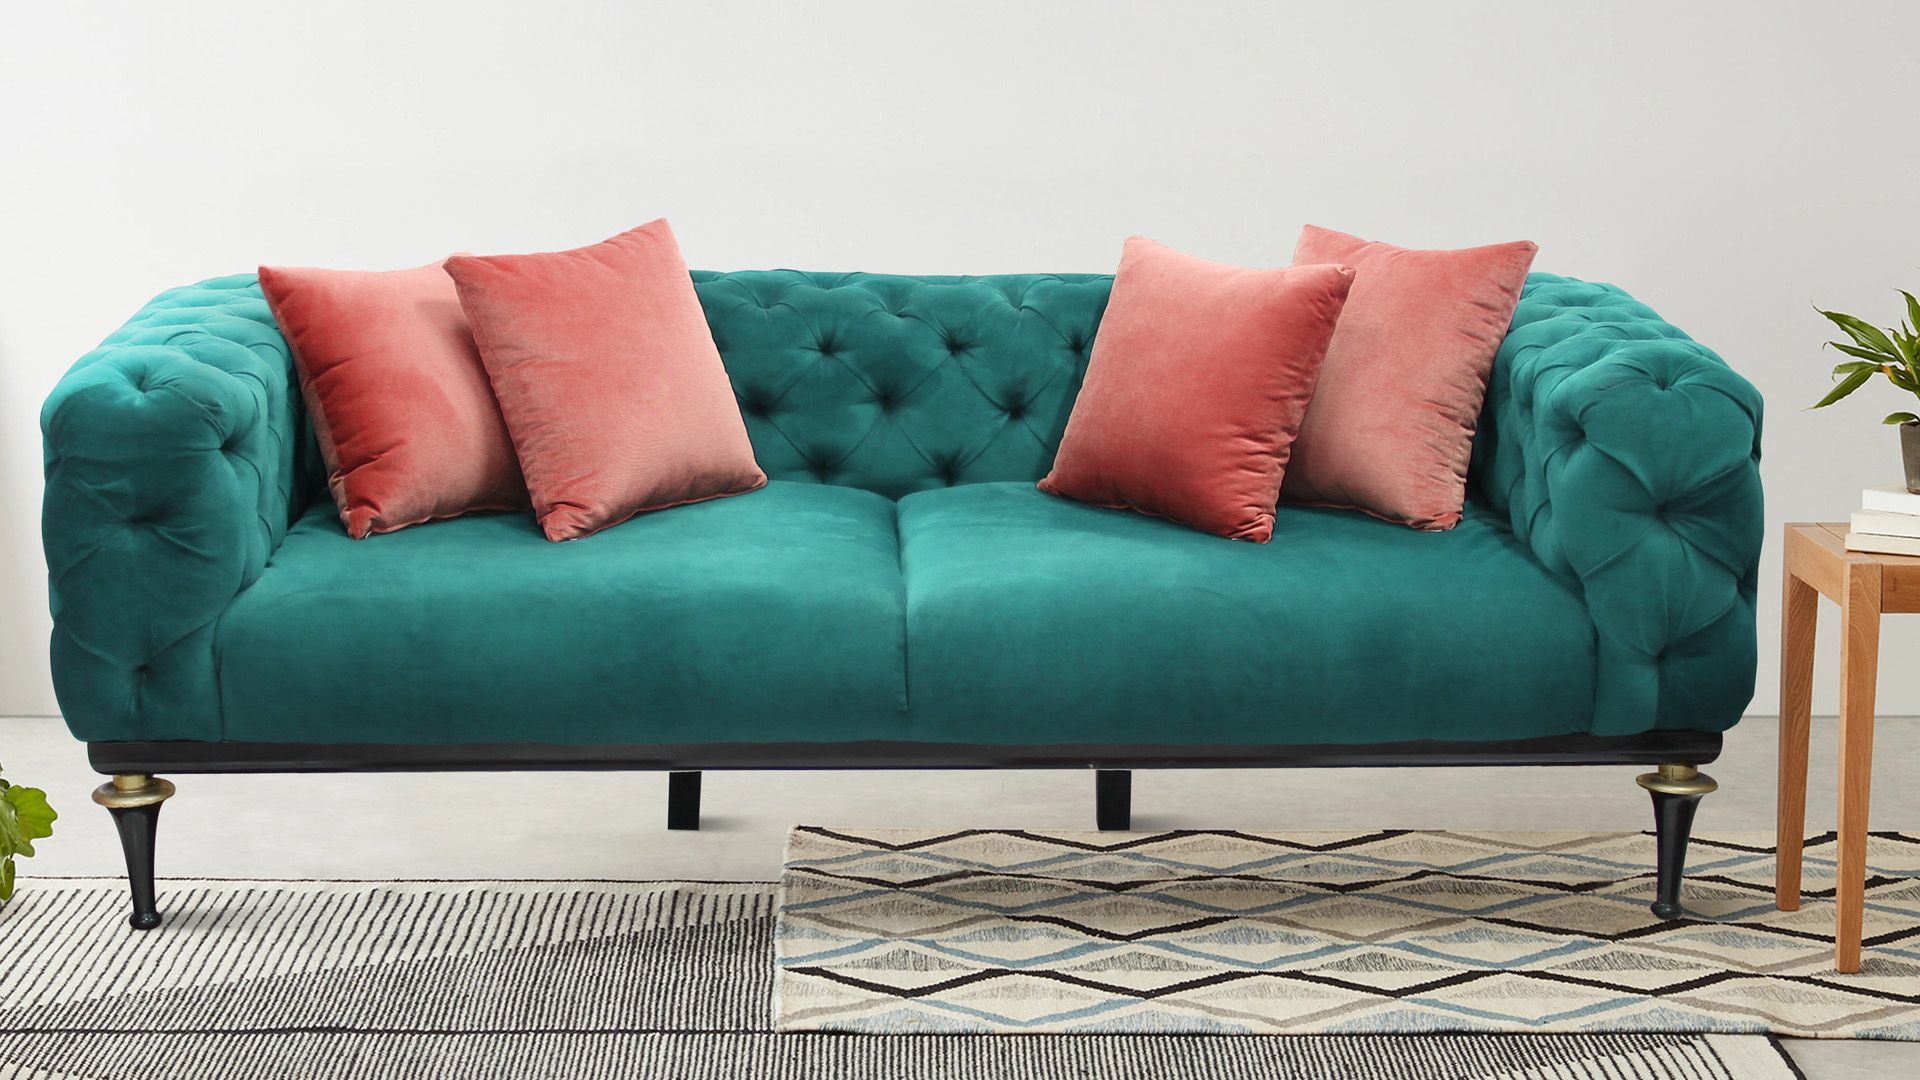 Harmony صالون مودرن 2020 In 2021 Furniture Home Decor Home